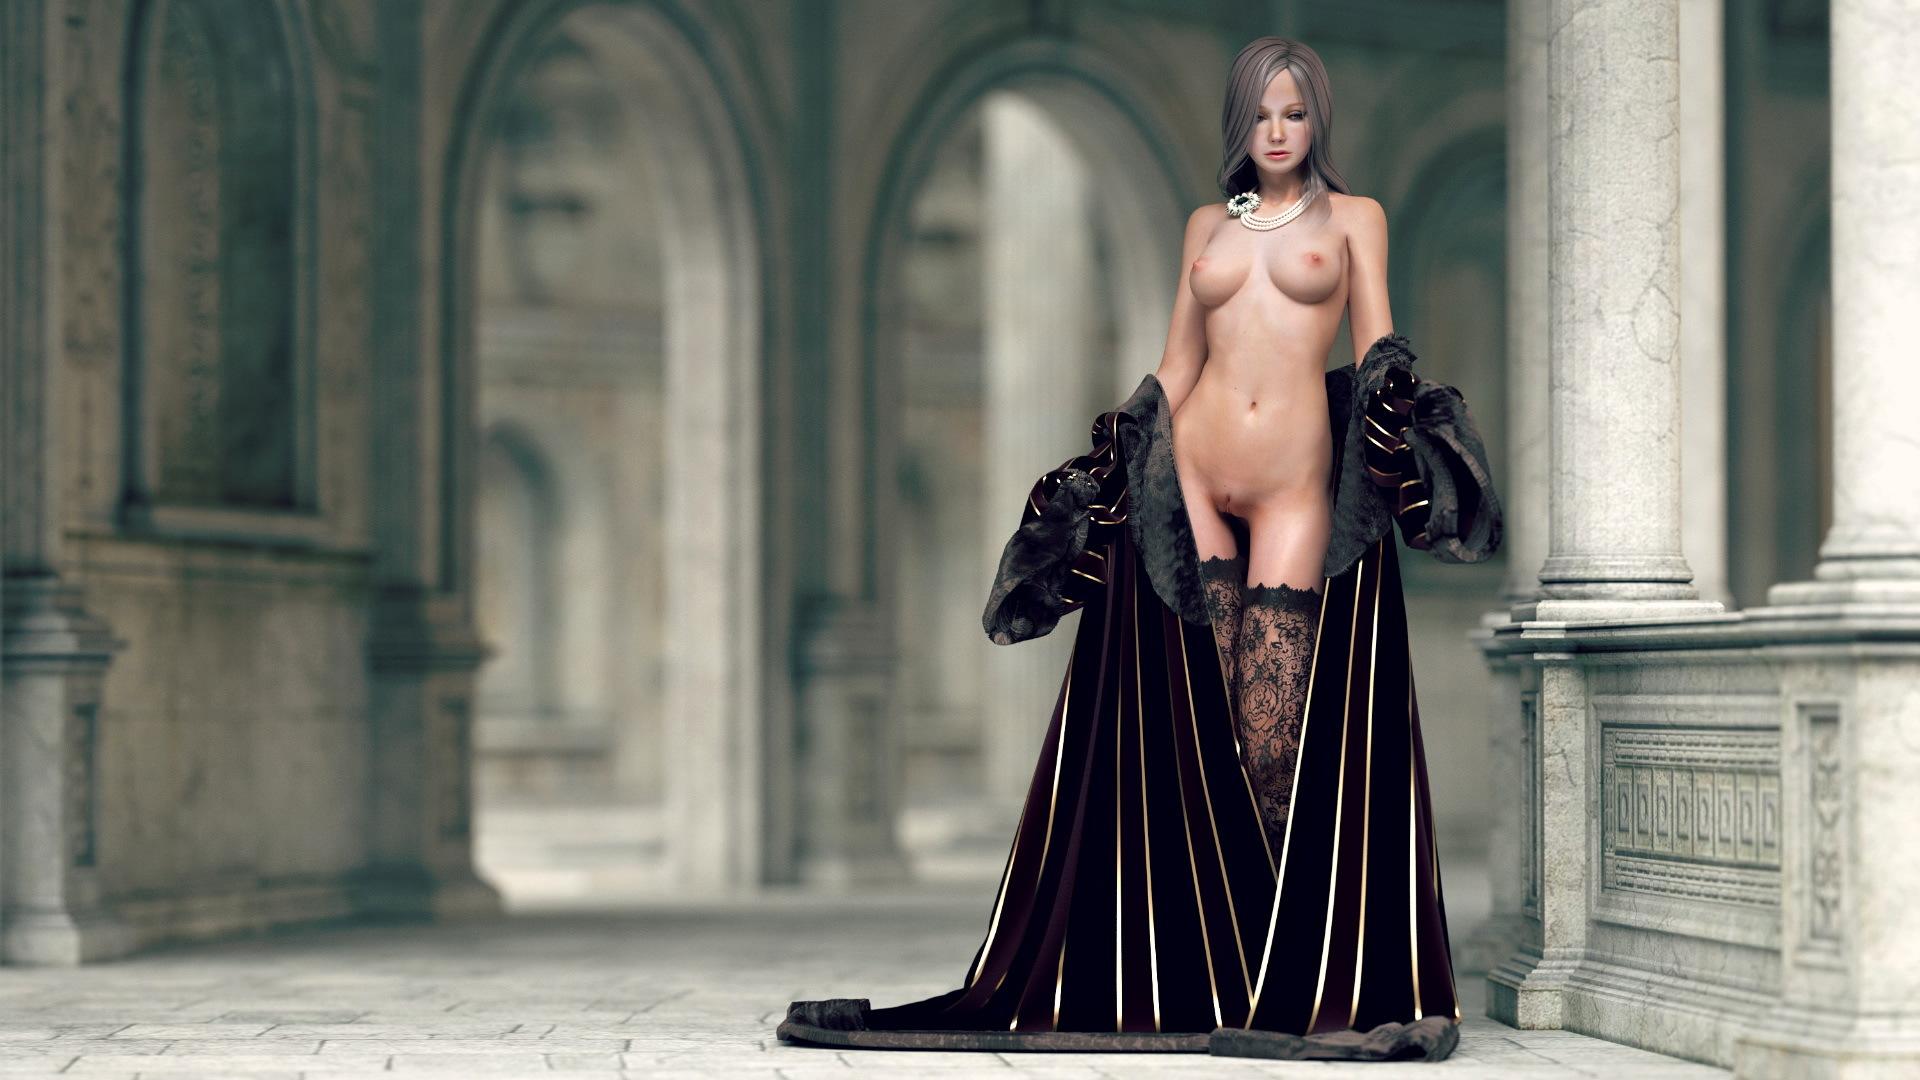 cherno-belie-oboi-erotika-v-gotike